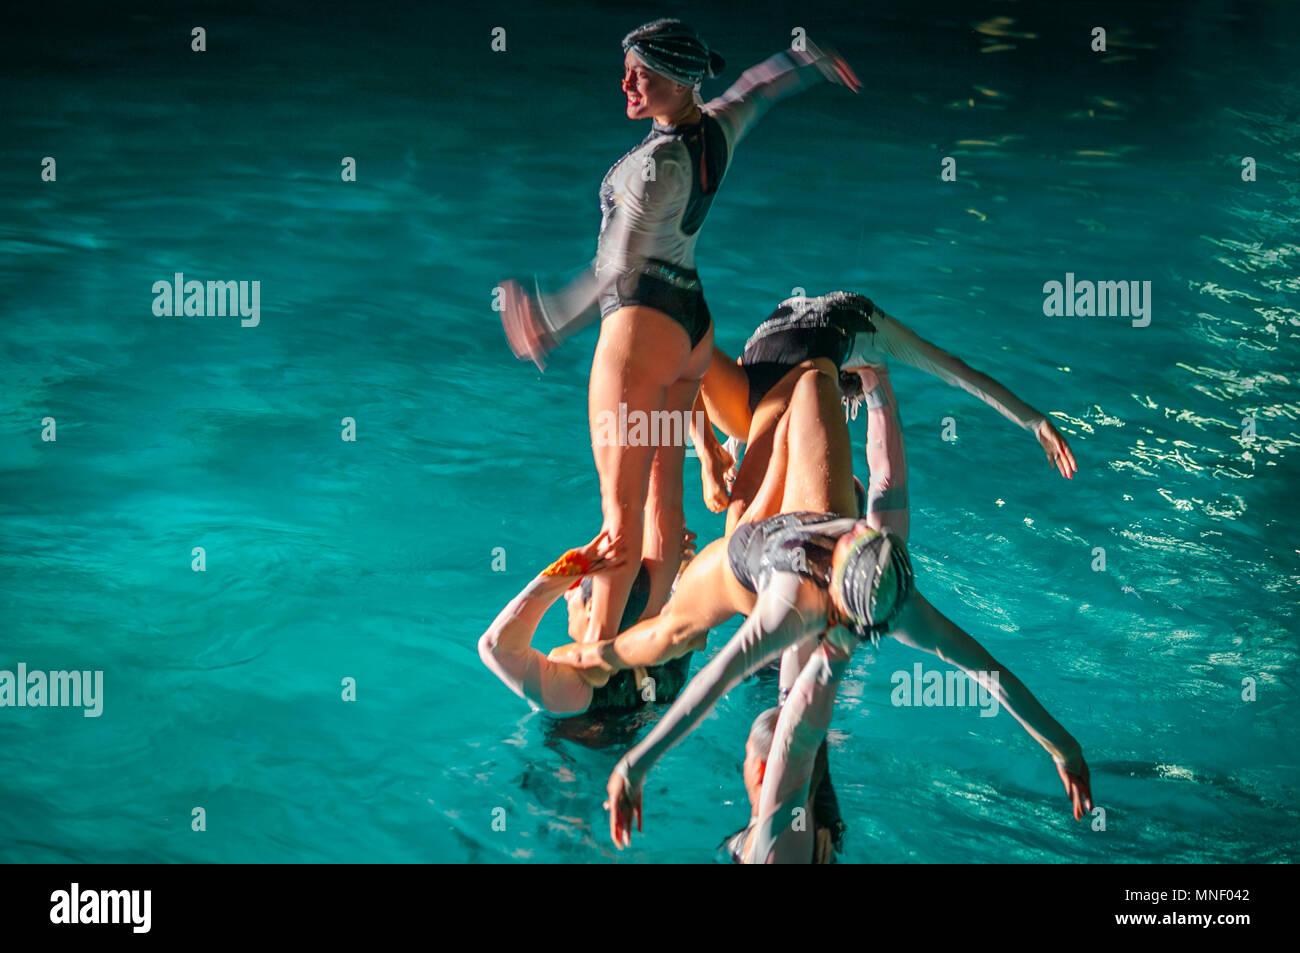 Synchronized aquatic ballet - Stock Image